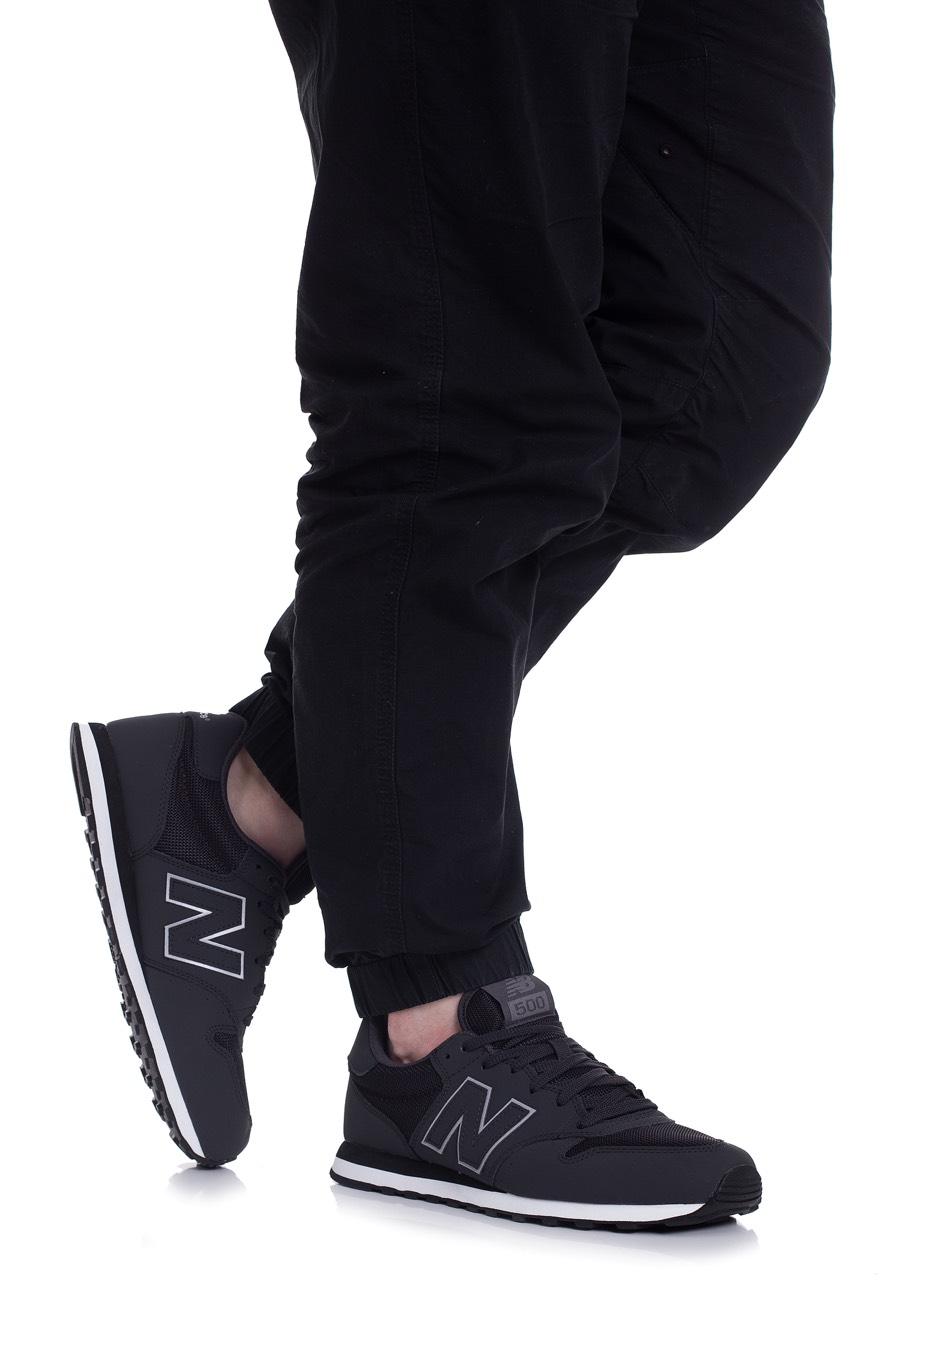 New Balance - GM500 D TRX Dark Grey - Shoes - Impericon.com US